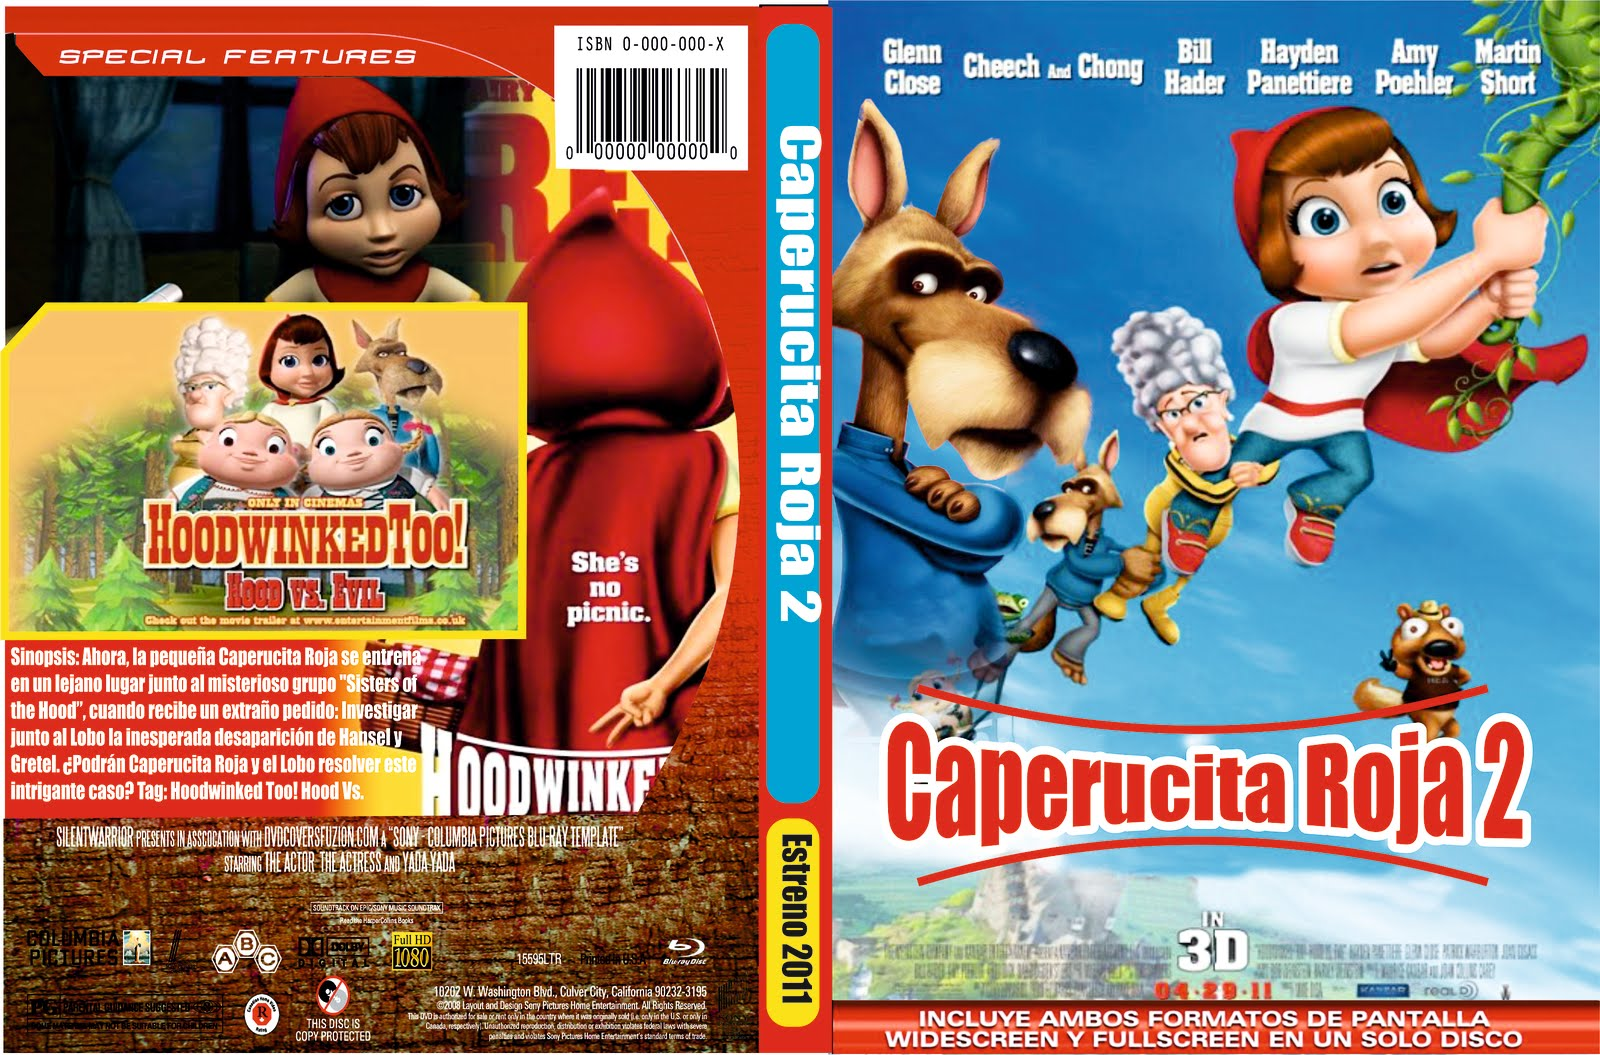 http://4.bp.blogspot.com/-YfDFalp9rO0/Tl-Cx0KFyBI/AAAAAAAAAdw/8nn7UnGRvJw/s1600/caperucita+roja+2.jpg